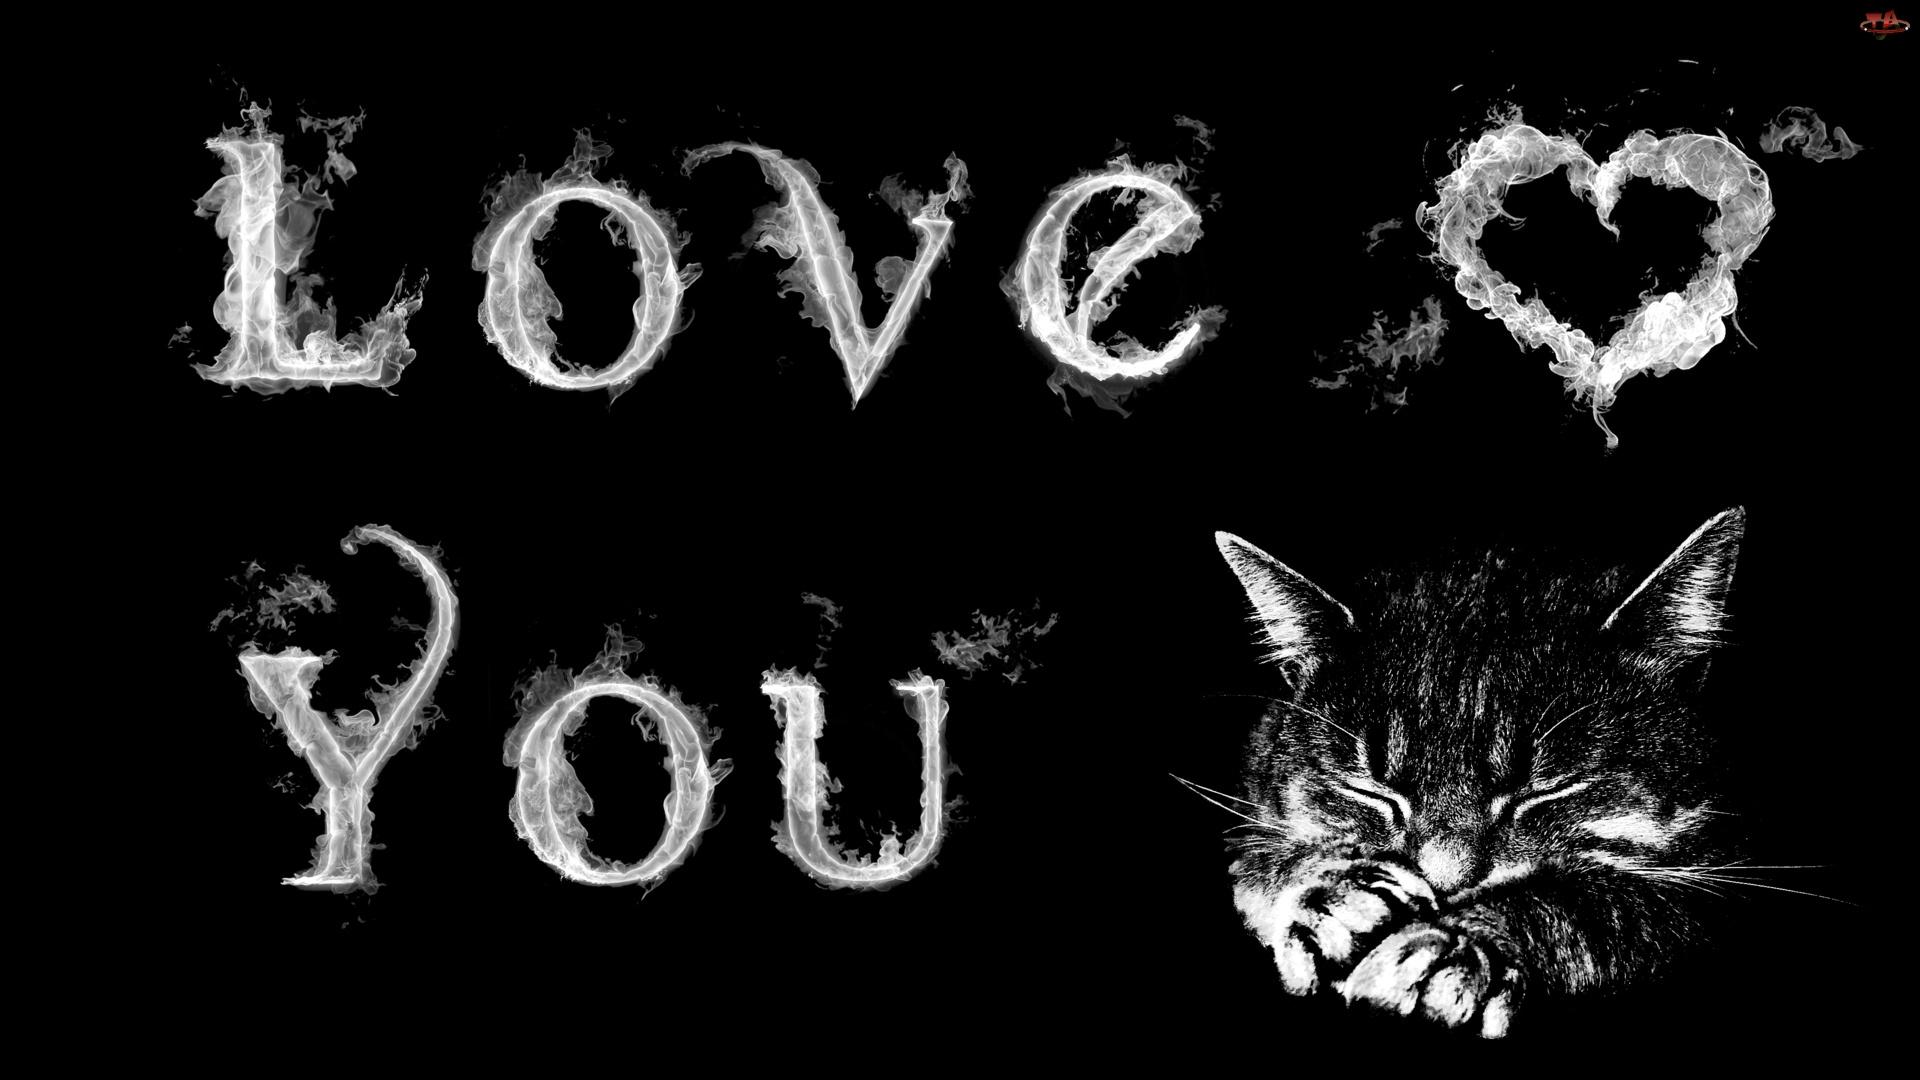 Kotek, Serduszko, Kocham, Cię